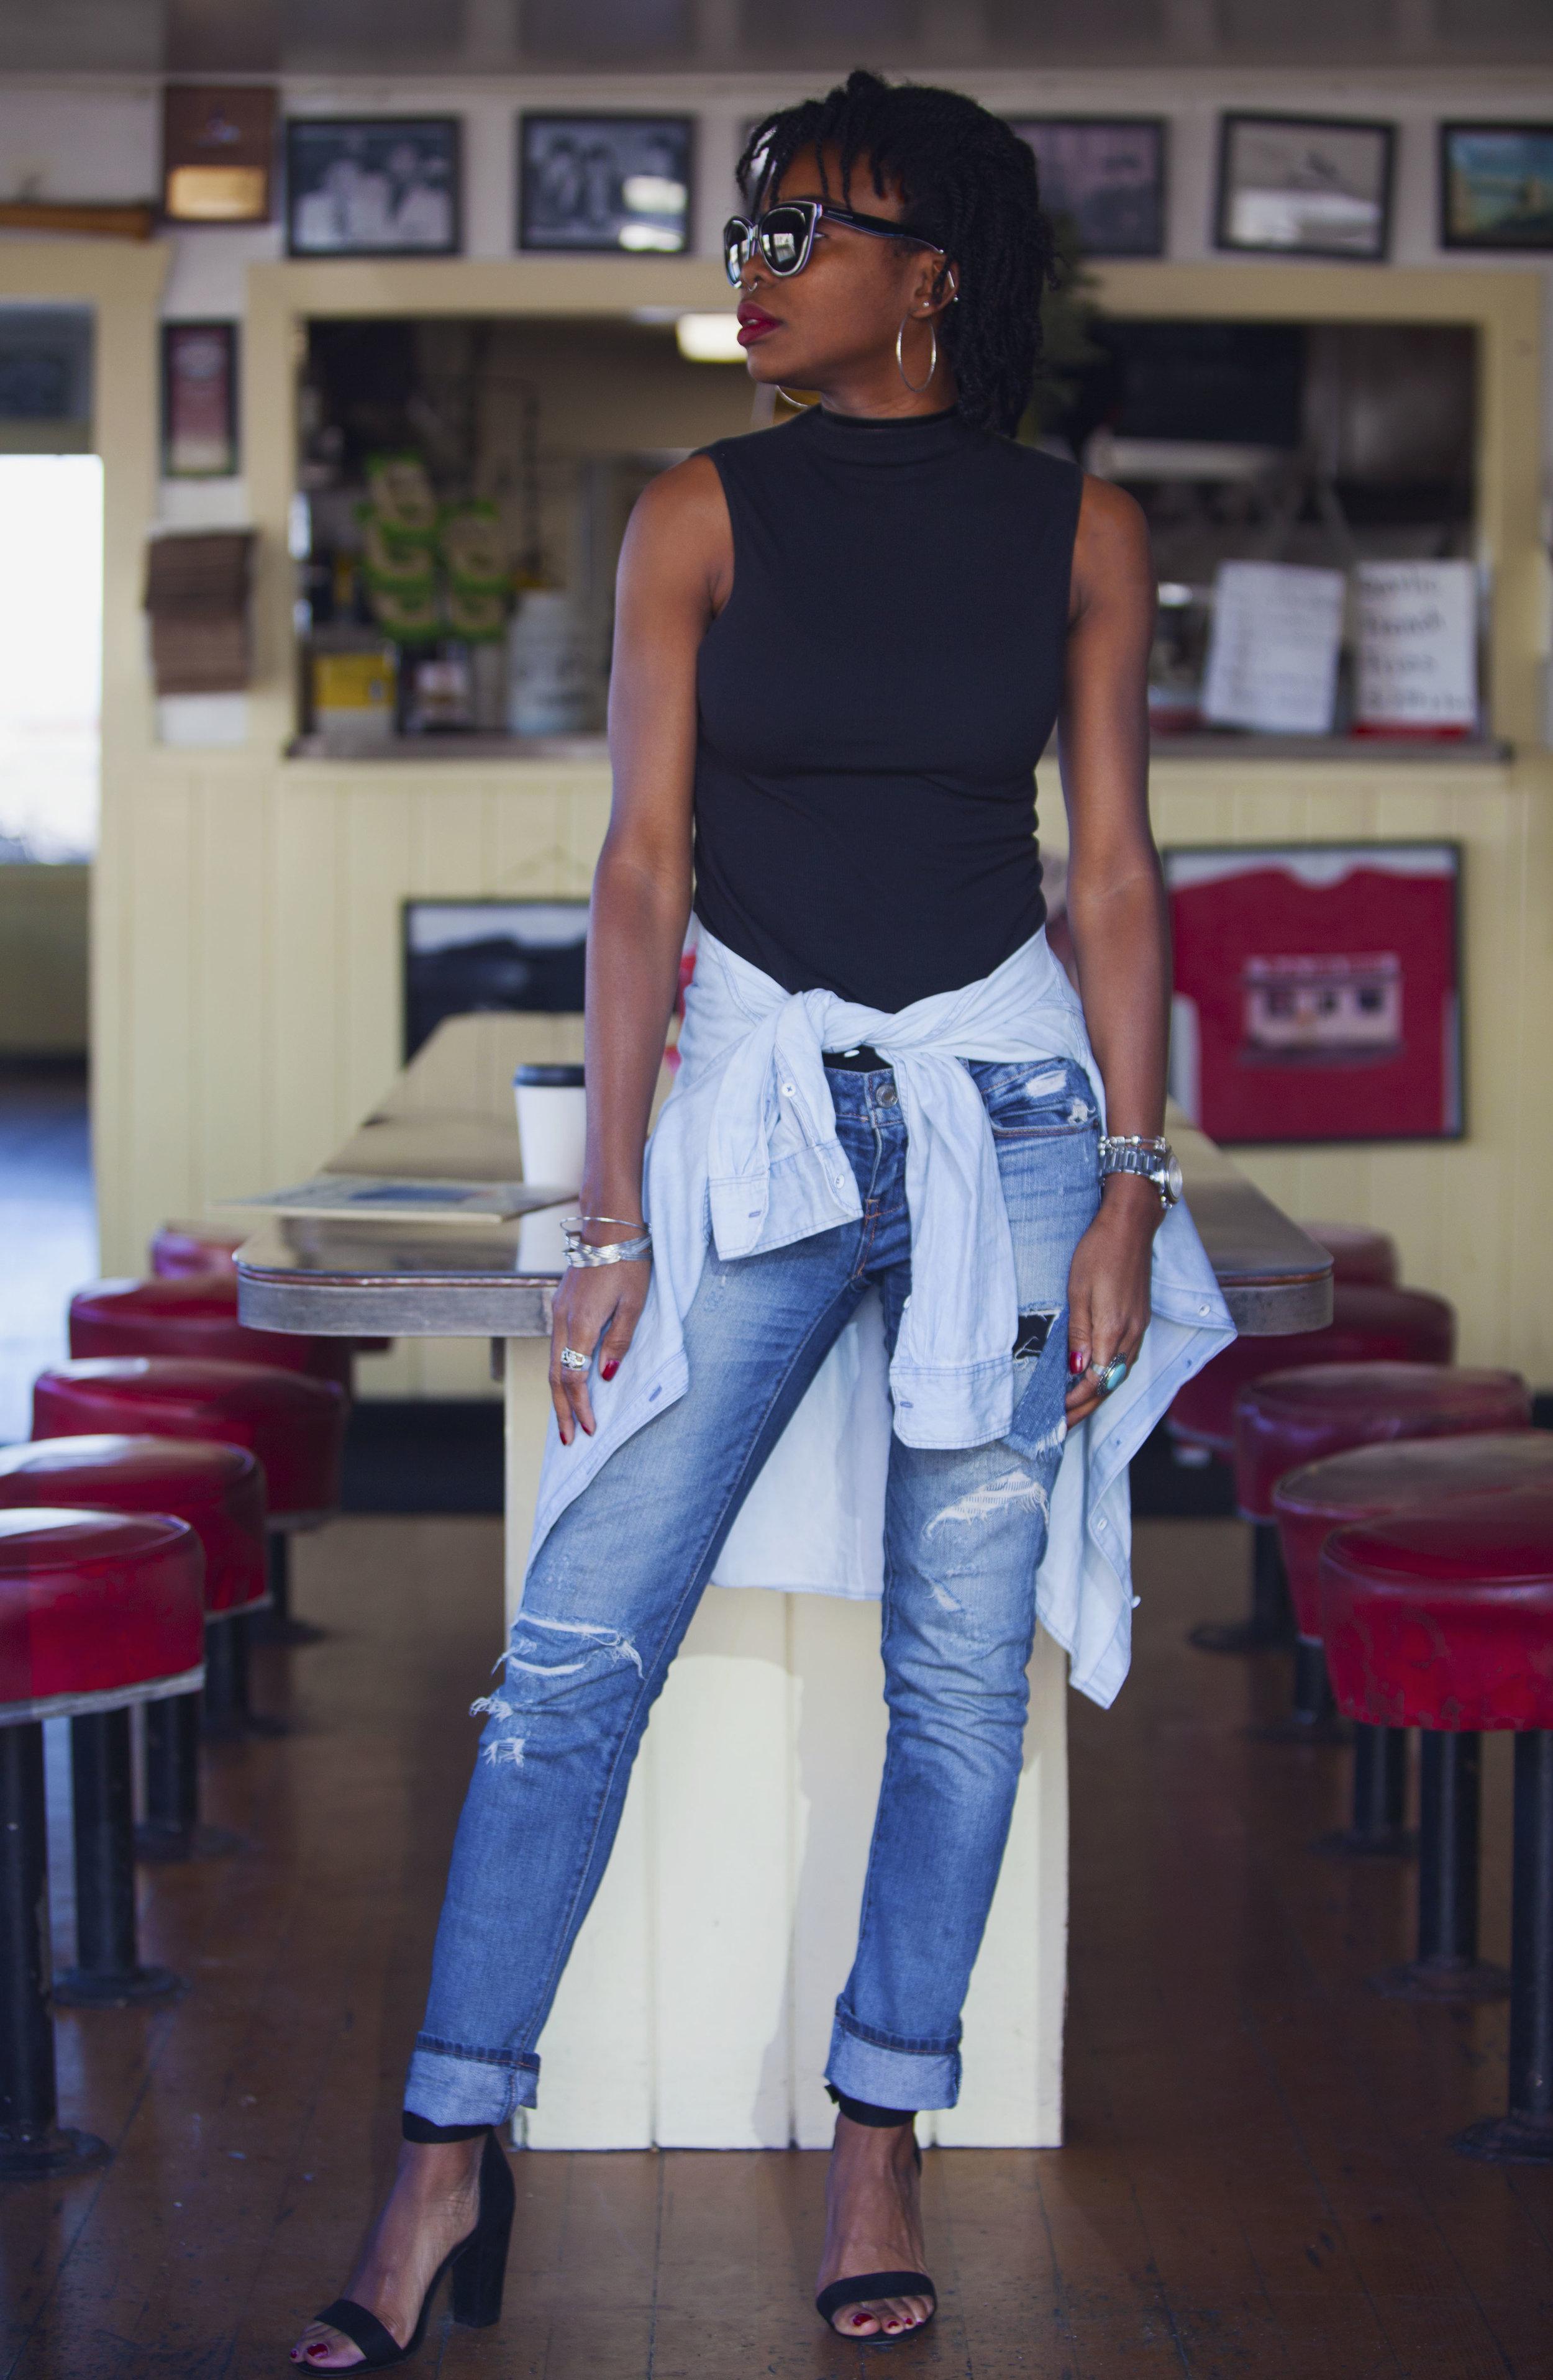 Tank: Mossimo (c/o Target); Shirt (tied): Banana Republic; Jeans: American Eagle; Shoes: Cape Robbin (c/o Target); Sunglasses: Dolce & Gabbana; Bag: Coach